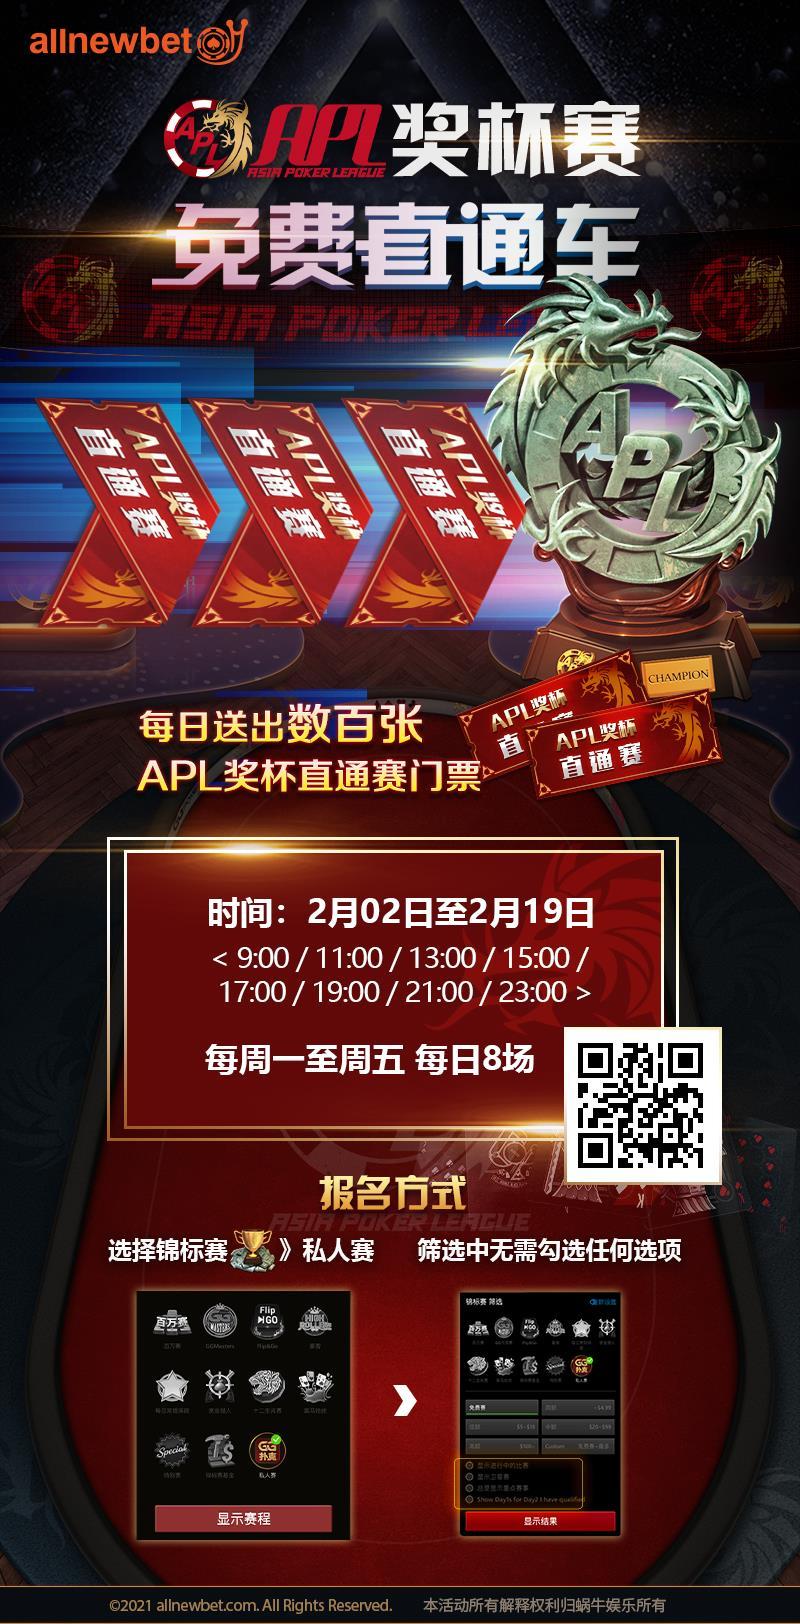 【GG扑克】APL奖杯赛免费直通车活动